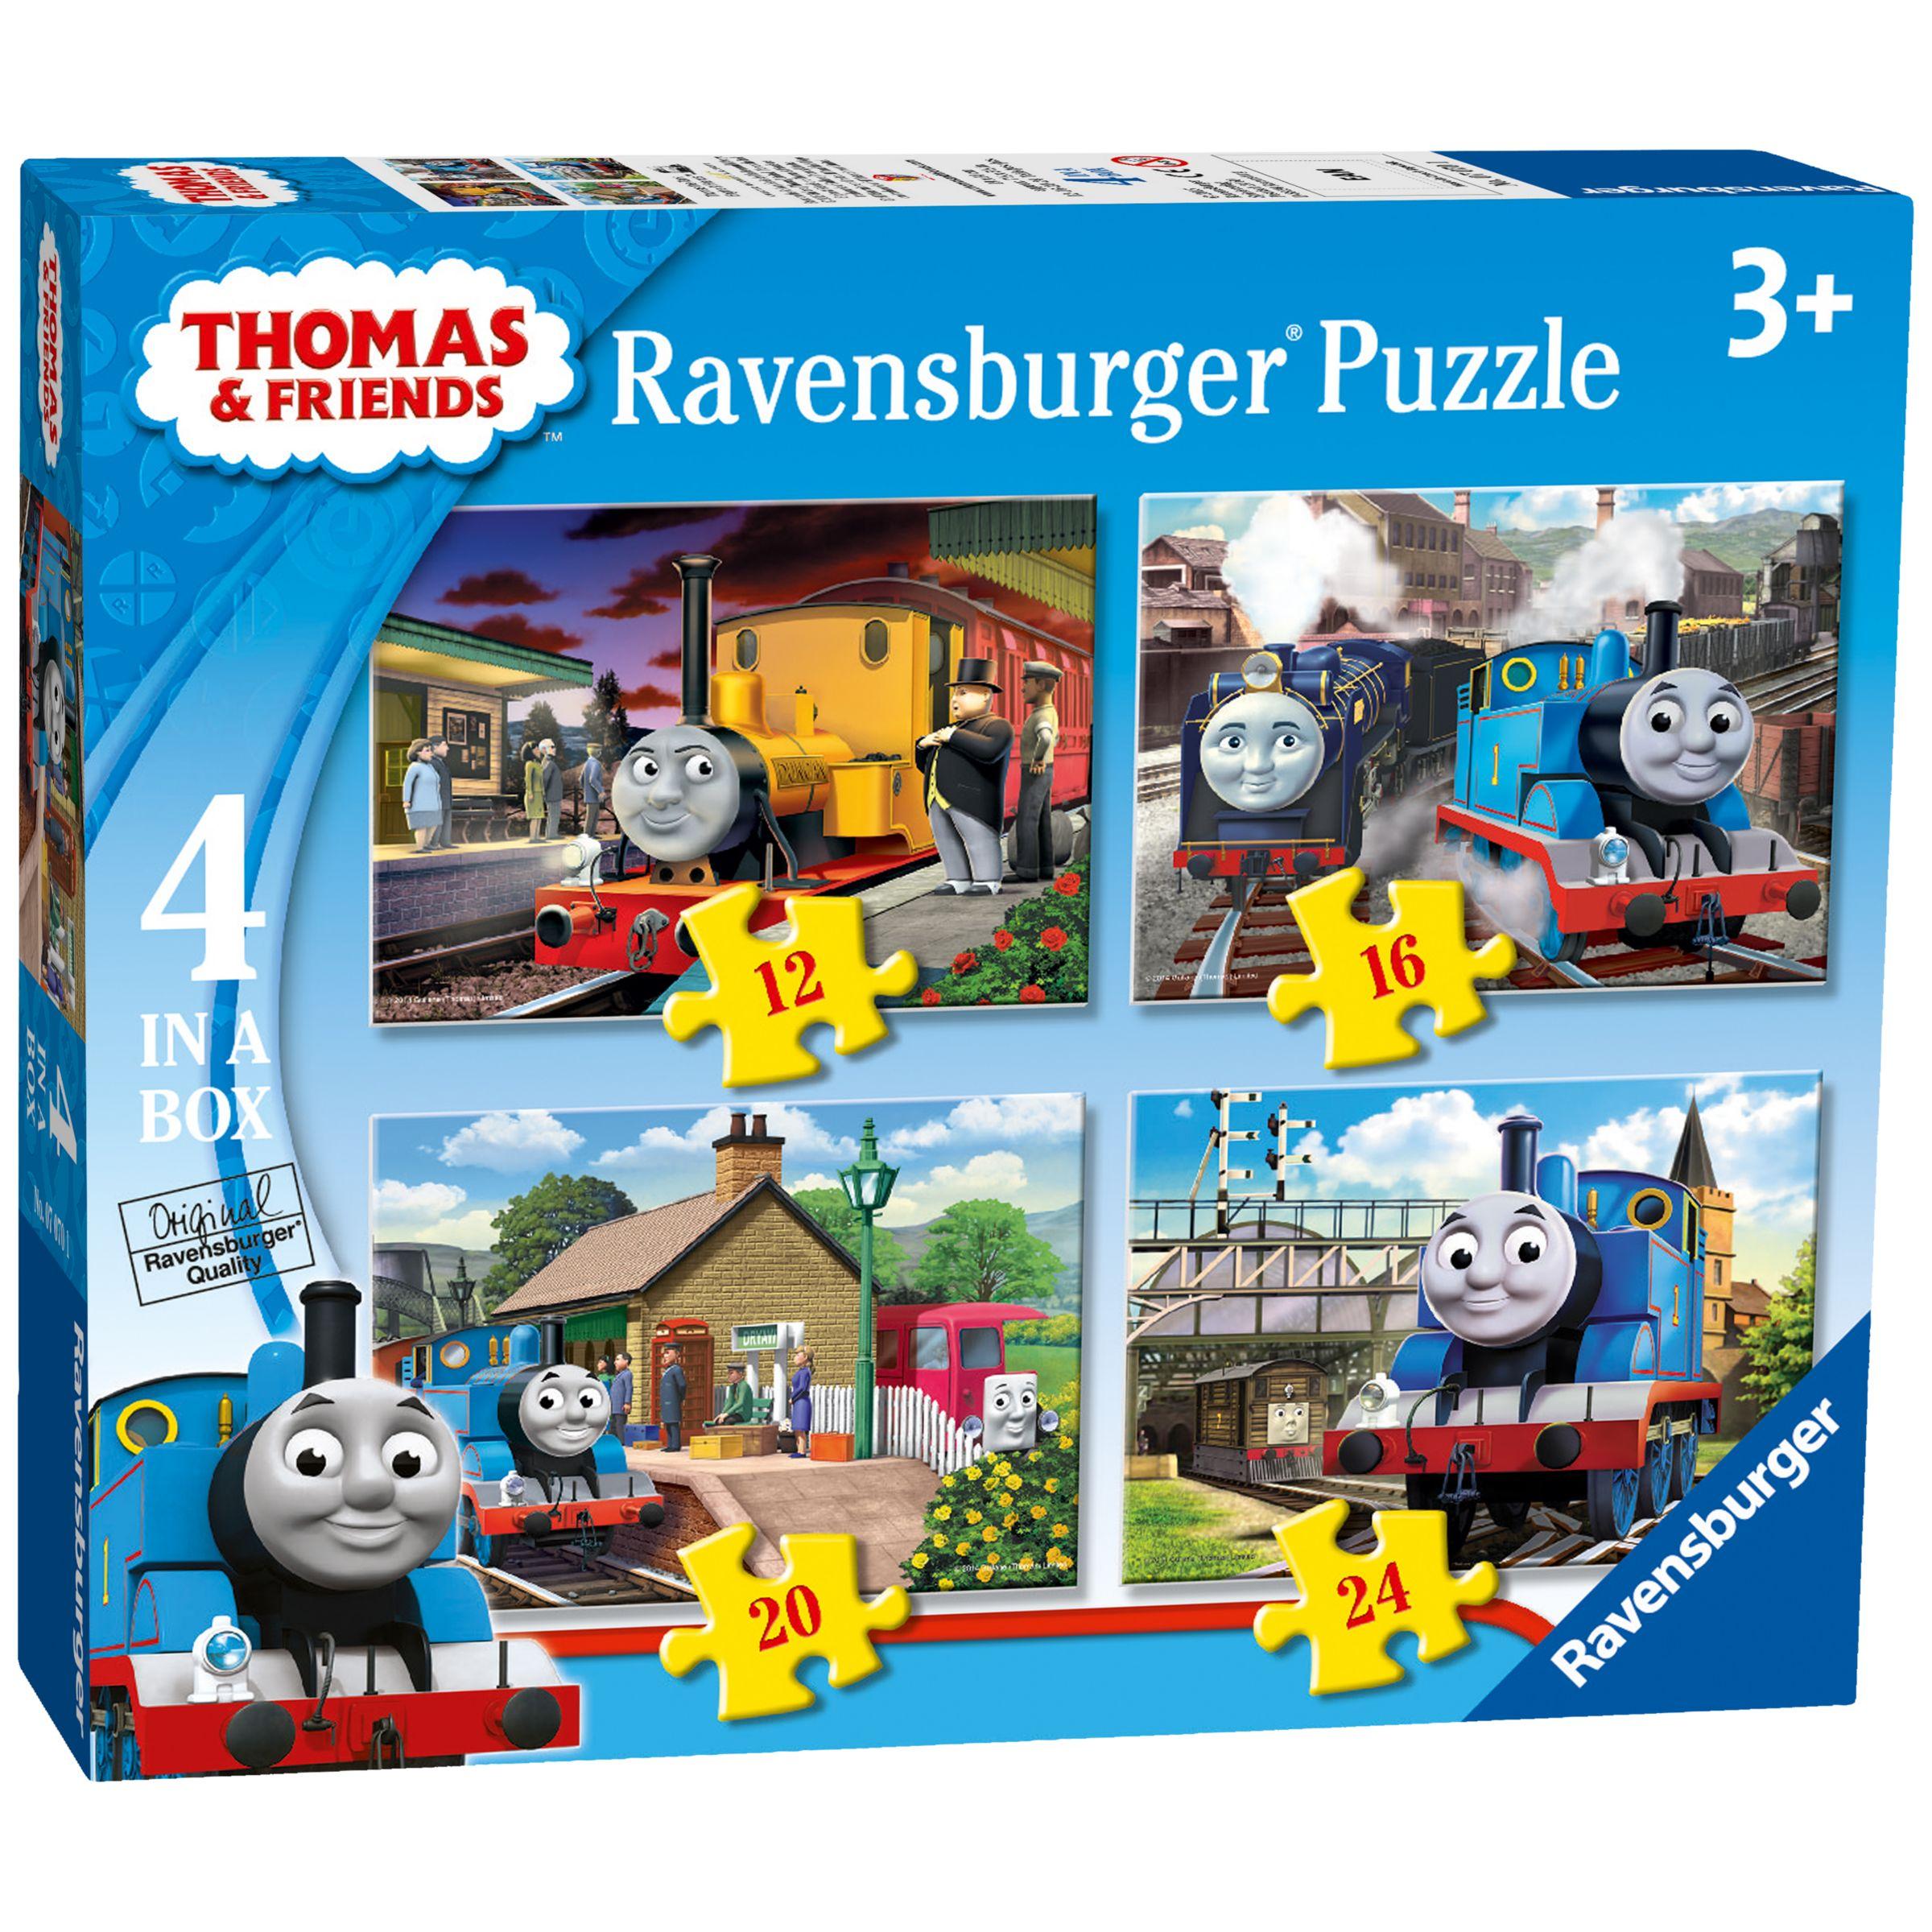 Thomas the Tank Engine Ravensburger Thomas & Friends Jigsaw Puzzles, Box of 4